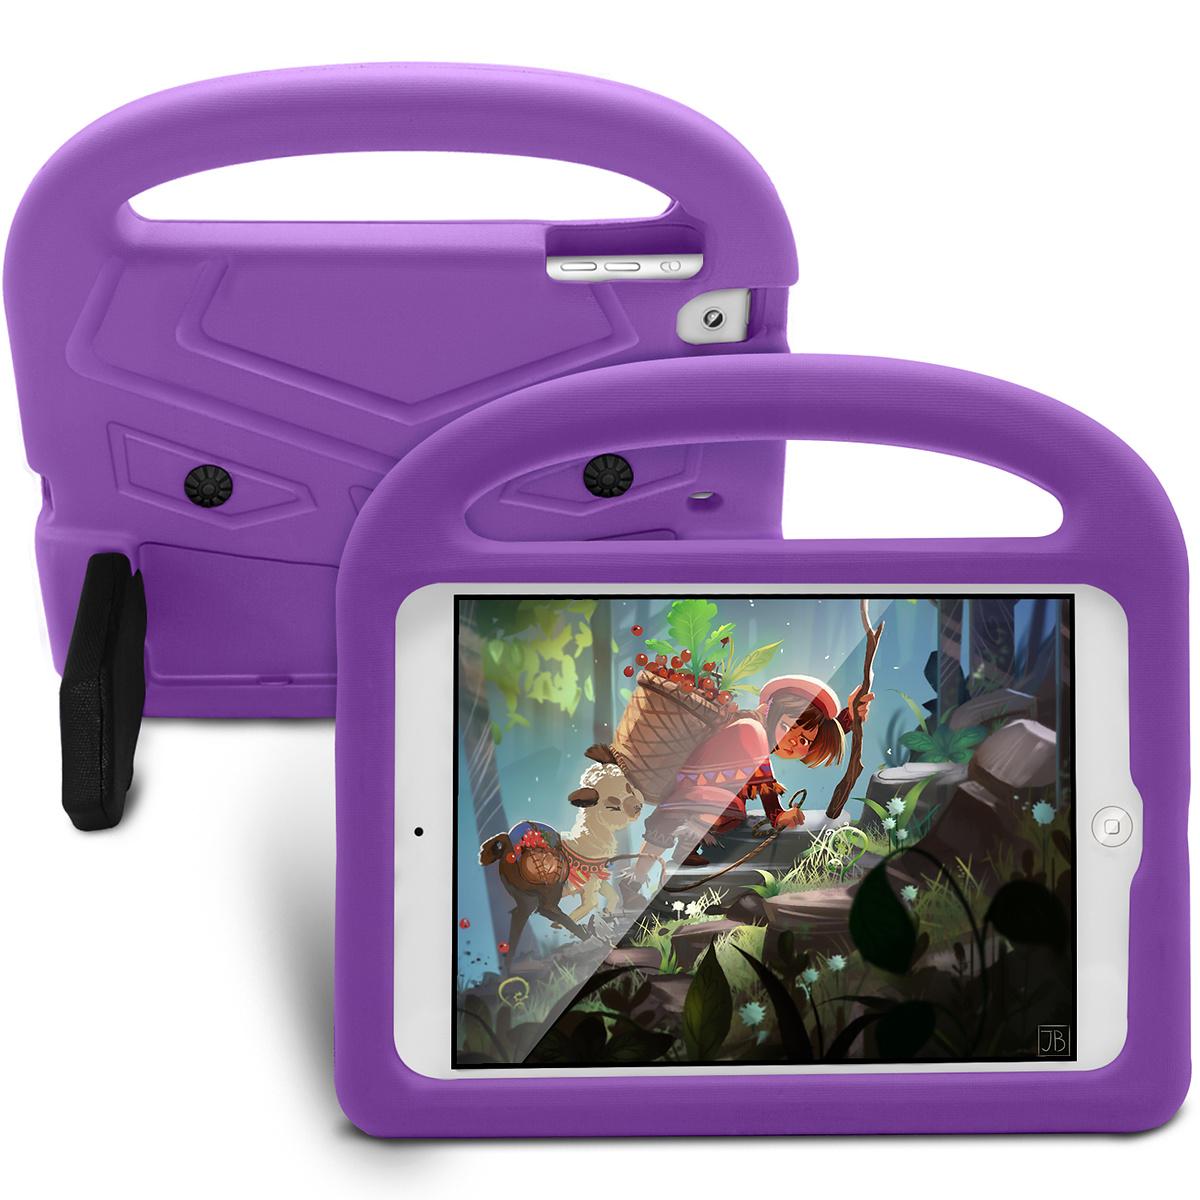 Barnfodral med ställ lila, iPad mini 2/3/4/5